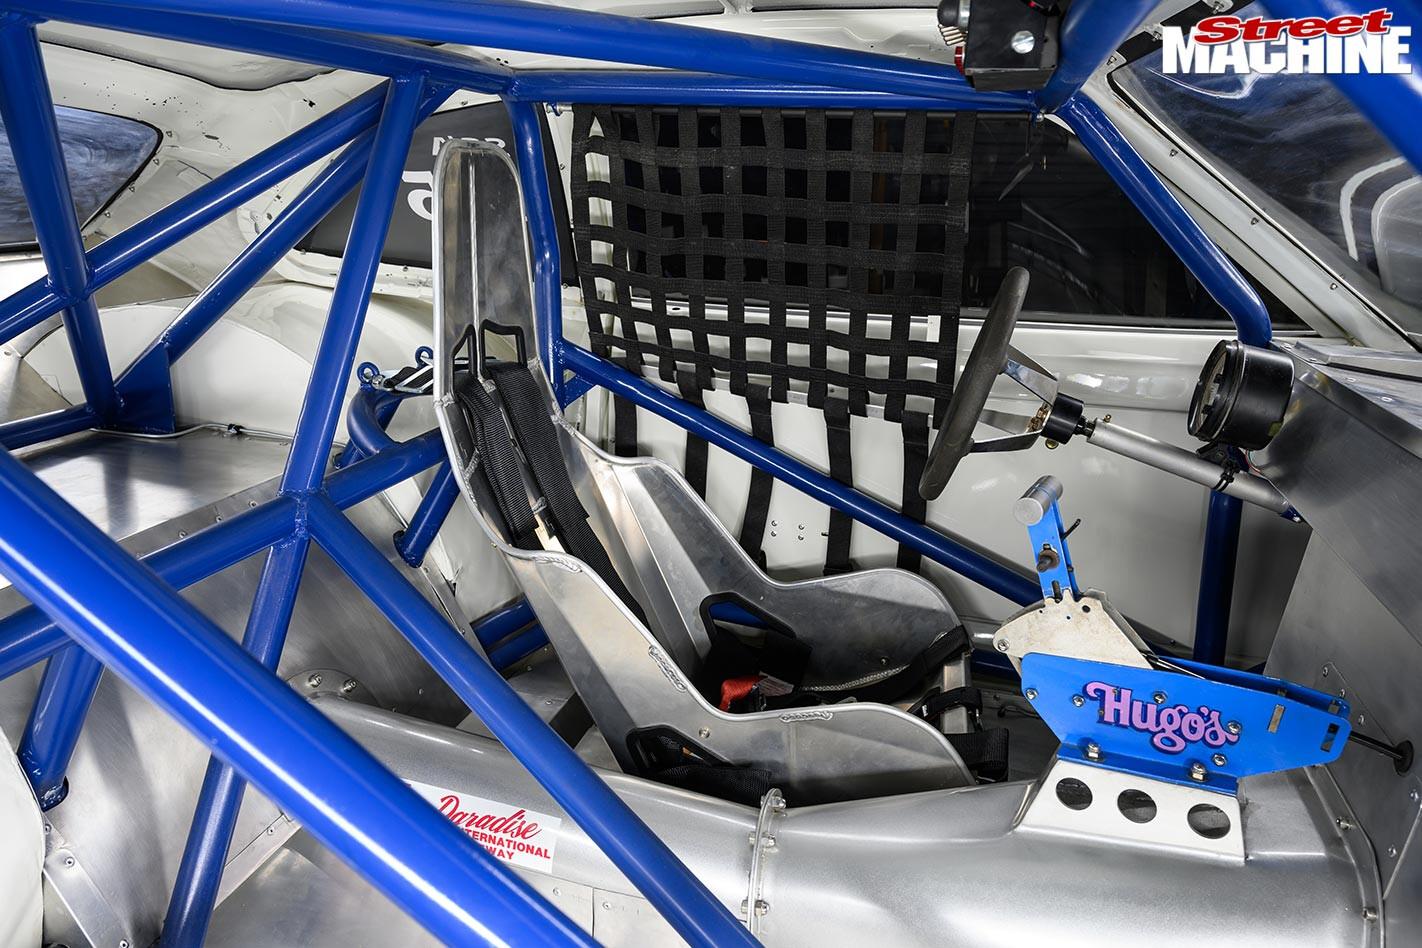 Ford Pinto drag car interior